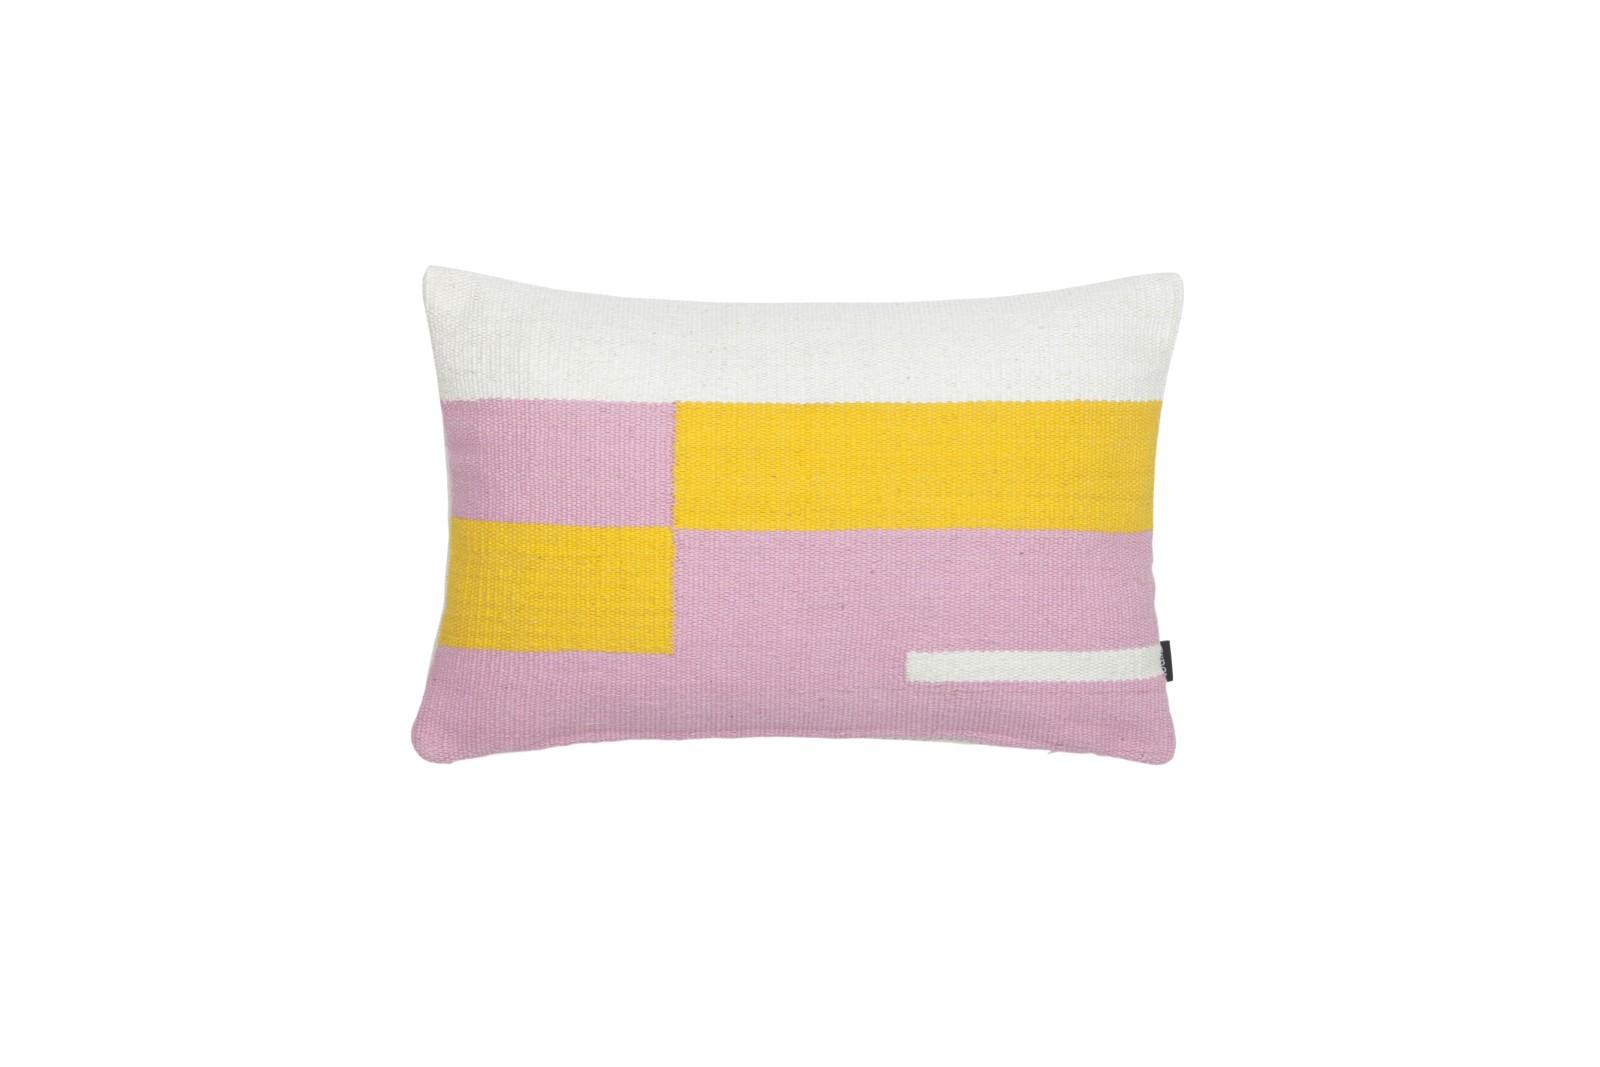 Jama-Khan Cushion Pink, Yellow & Ivory Rectangle Cushion